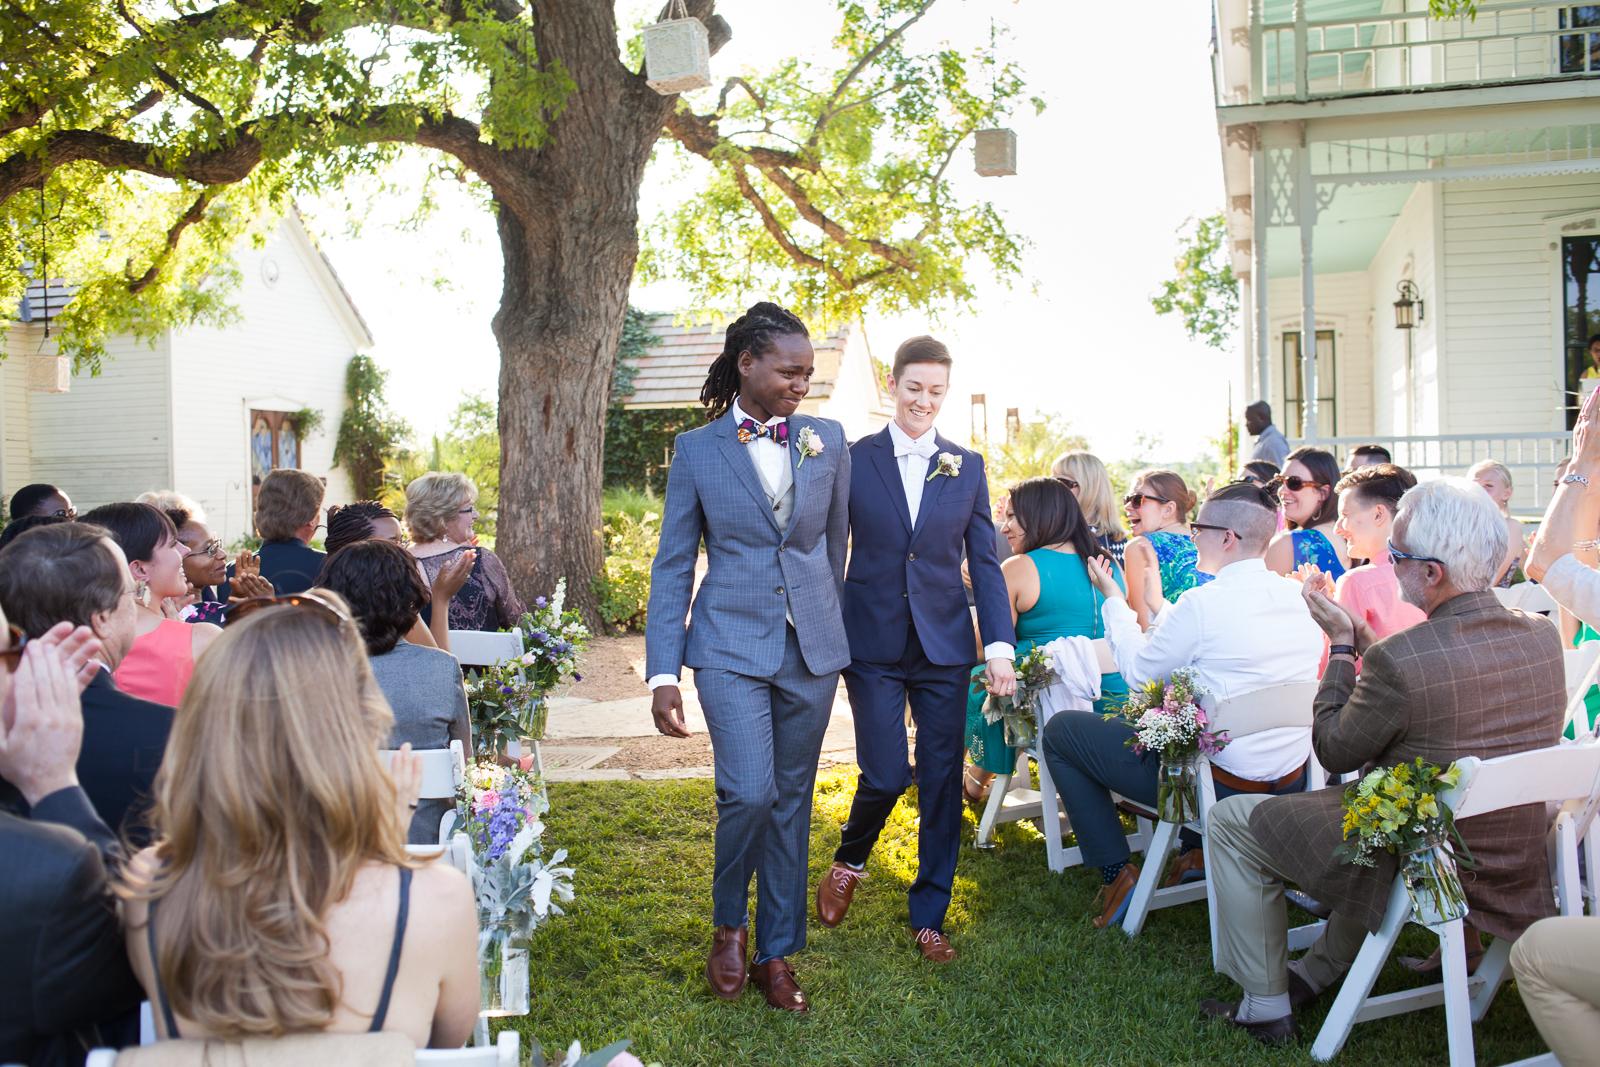 barr-mansion-wedding-014.jpg